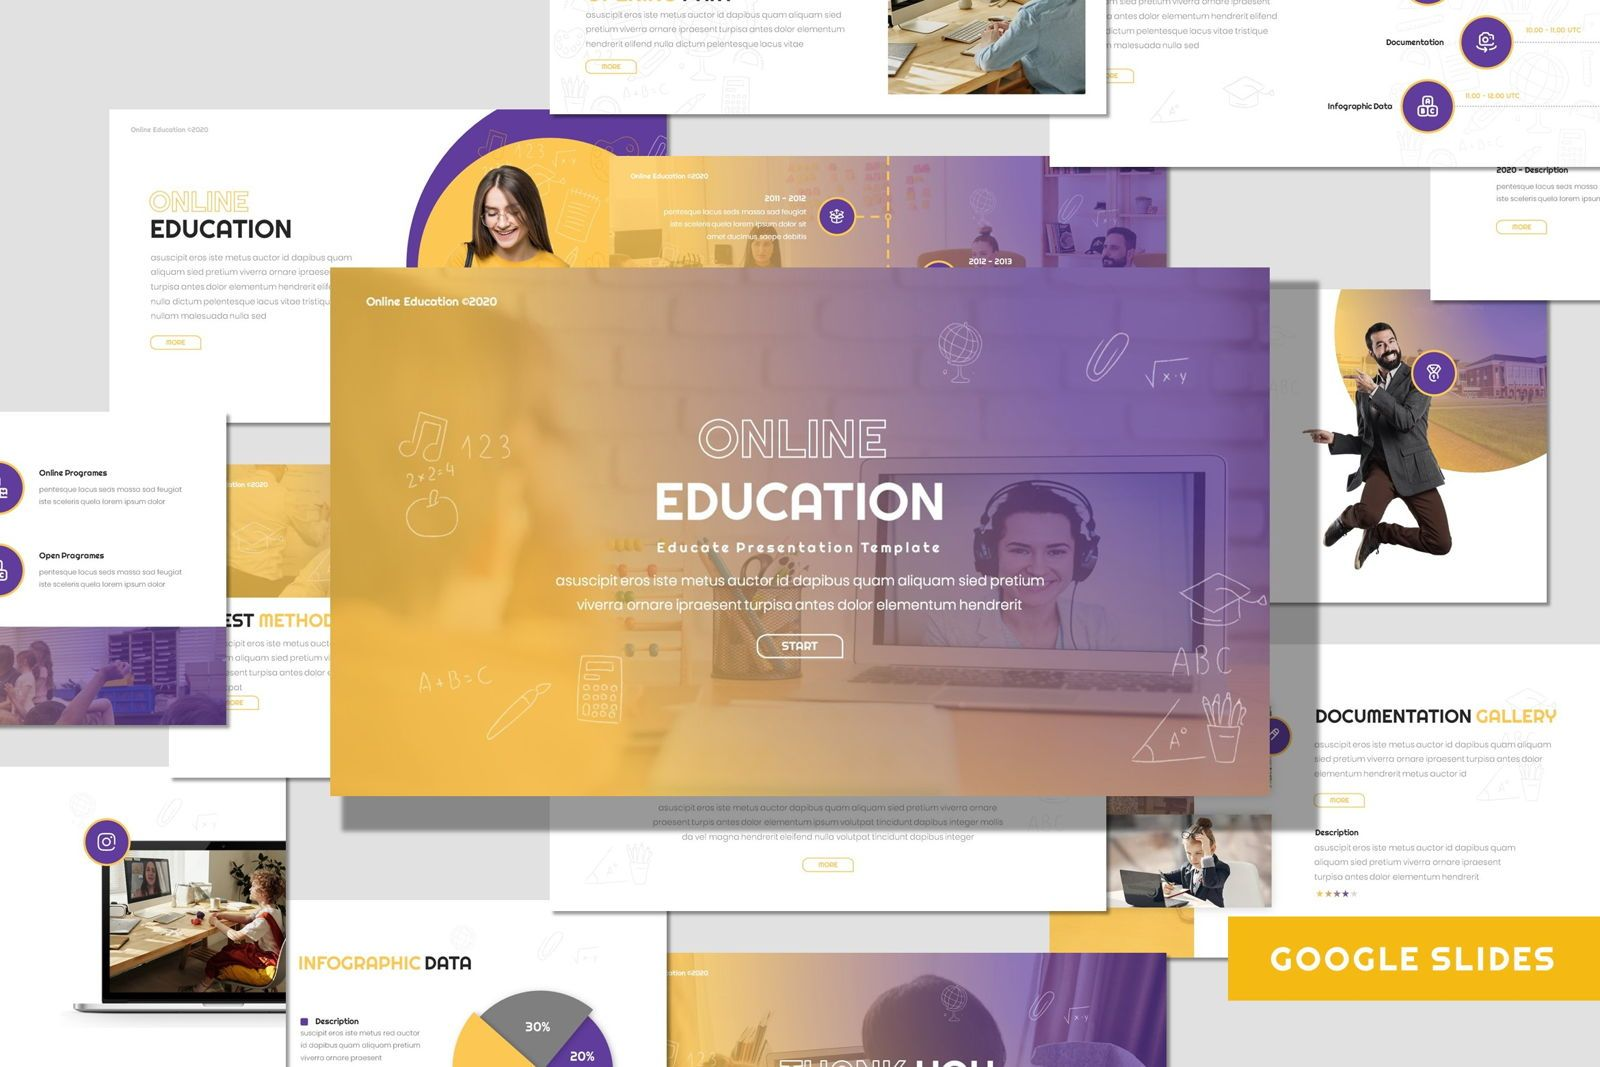 Online Education - Google Slides Template, 08047, Presentation Templates — PoweredTemplate.com